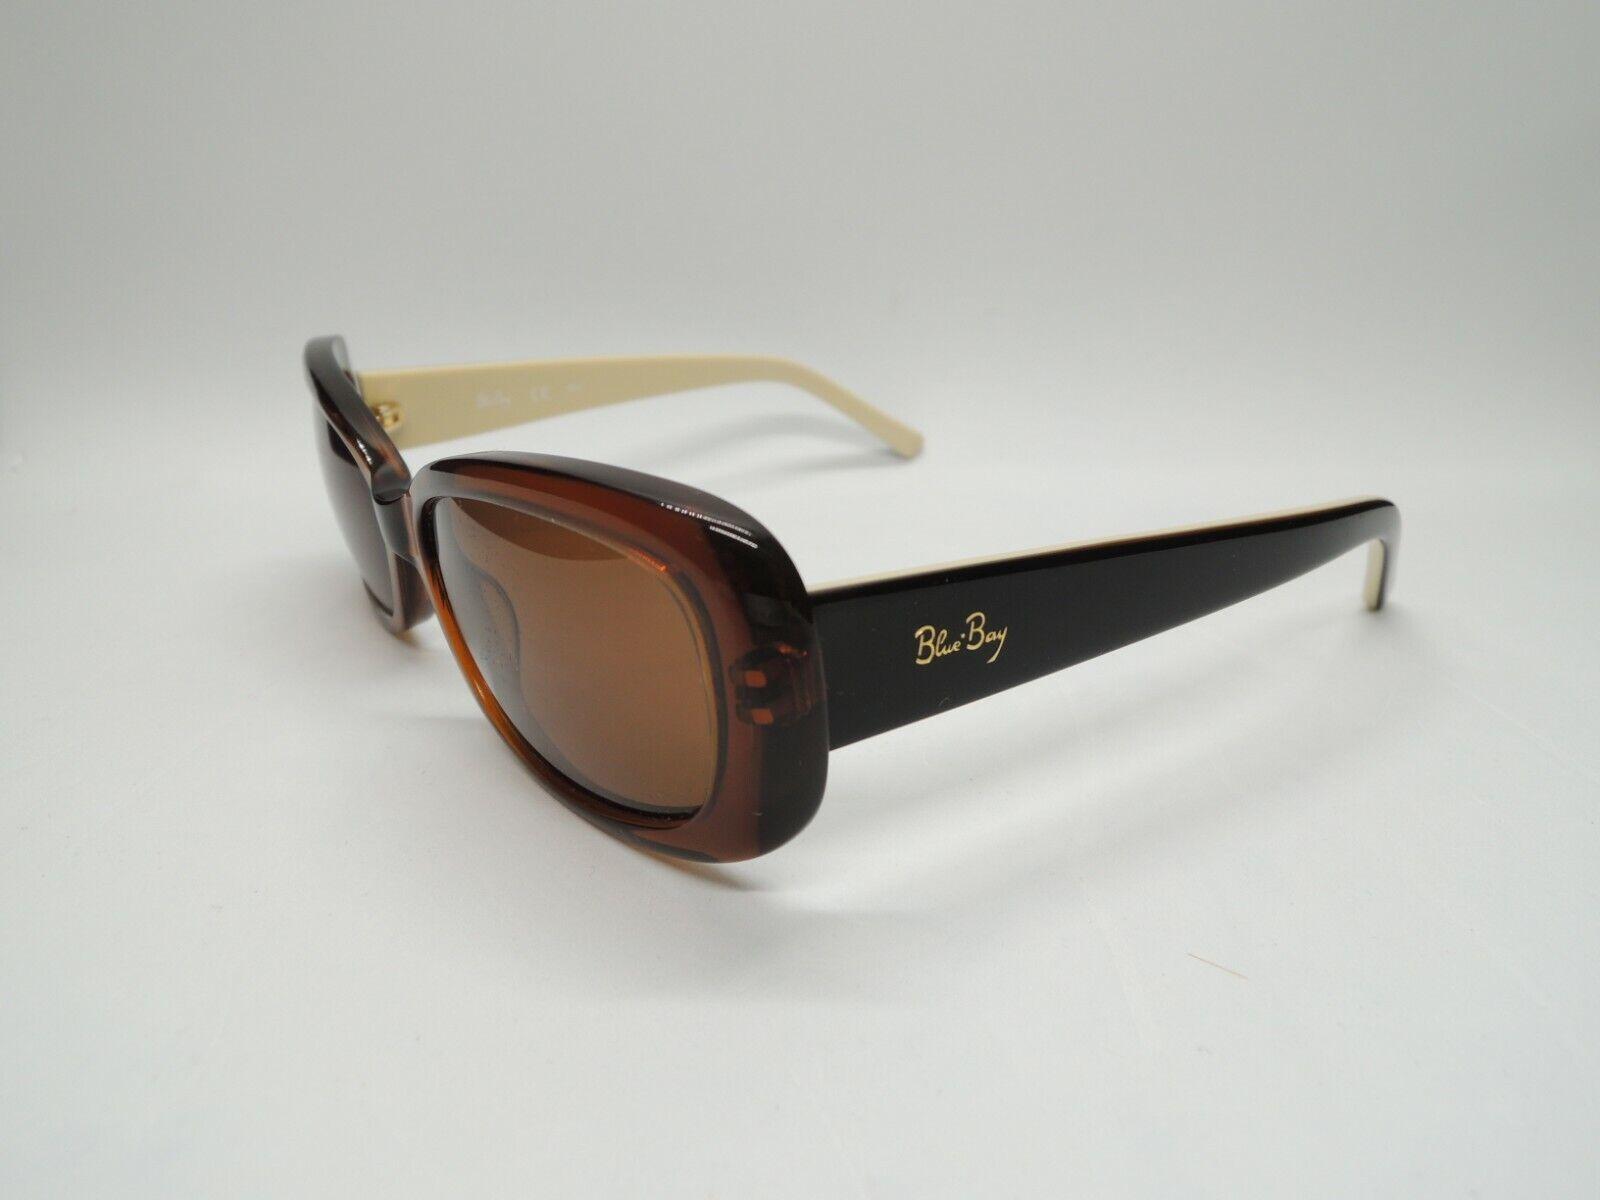 SAFILO B&B BLUE BAY MONT SERRAT 17WCC Brown/Black Mirrored Sunglasses 52-17-130